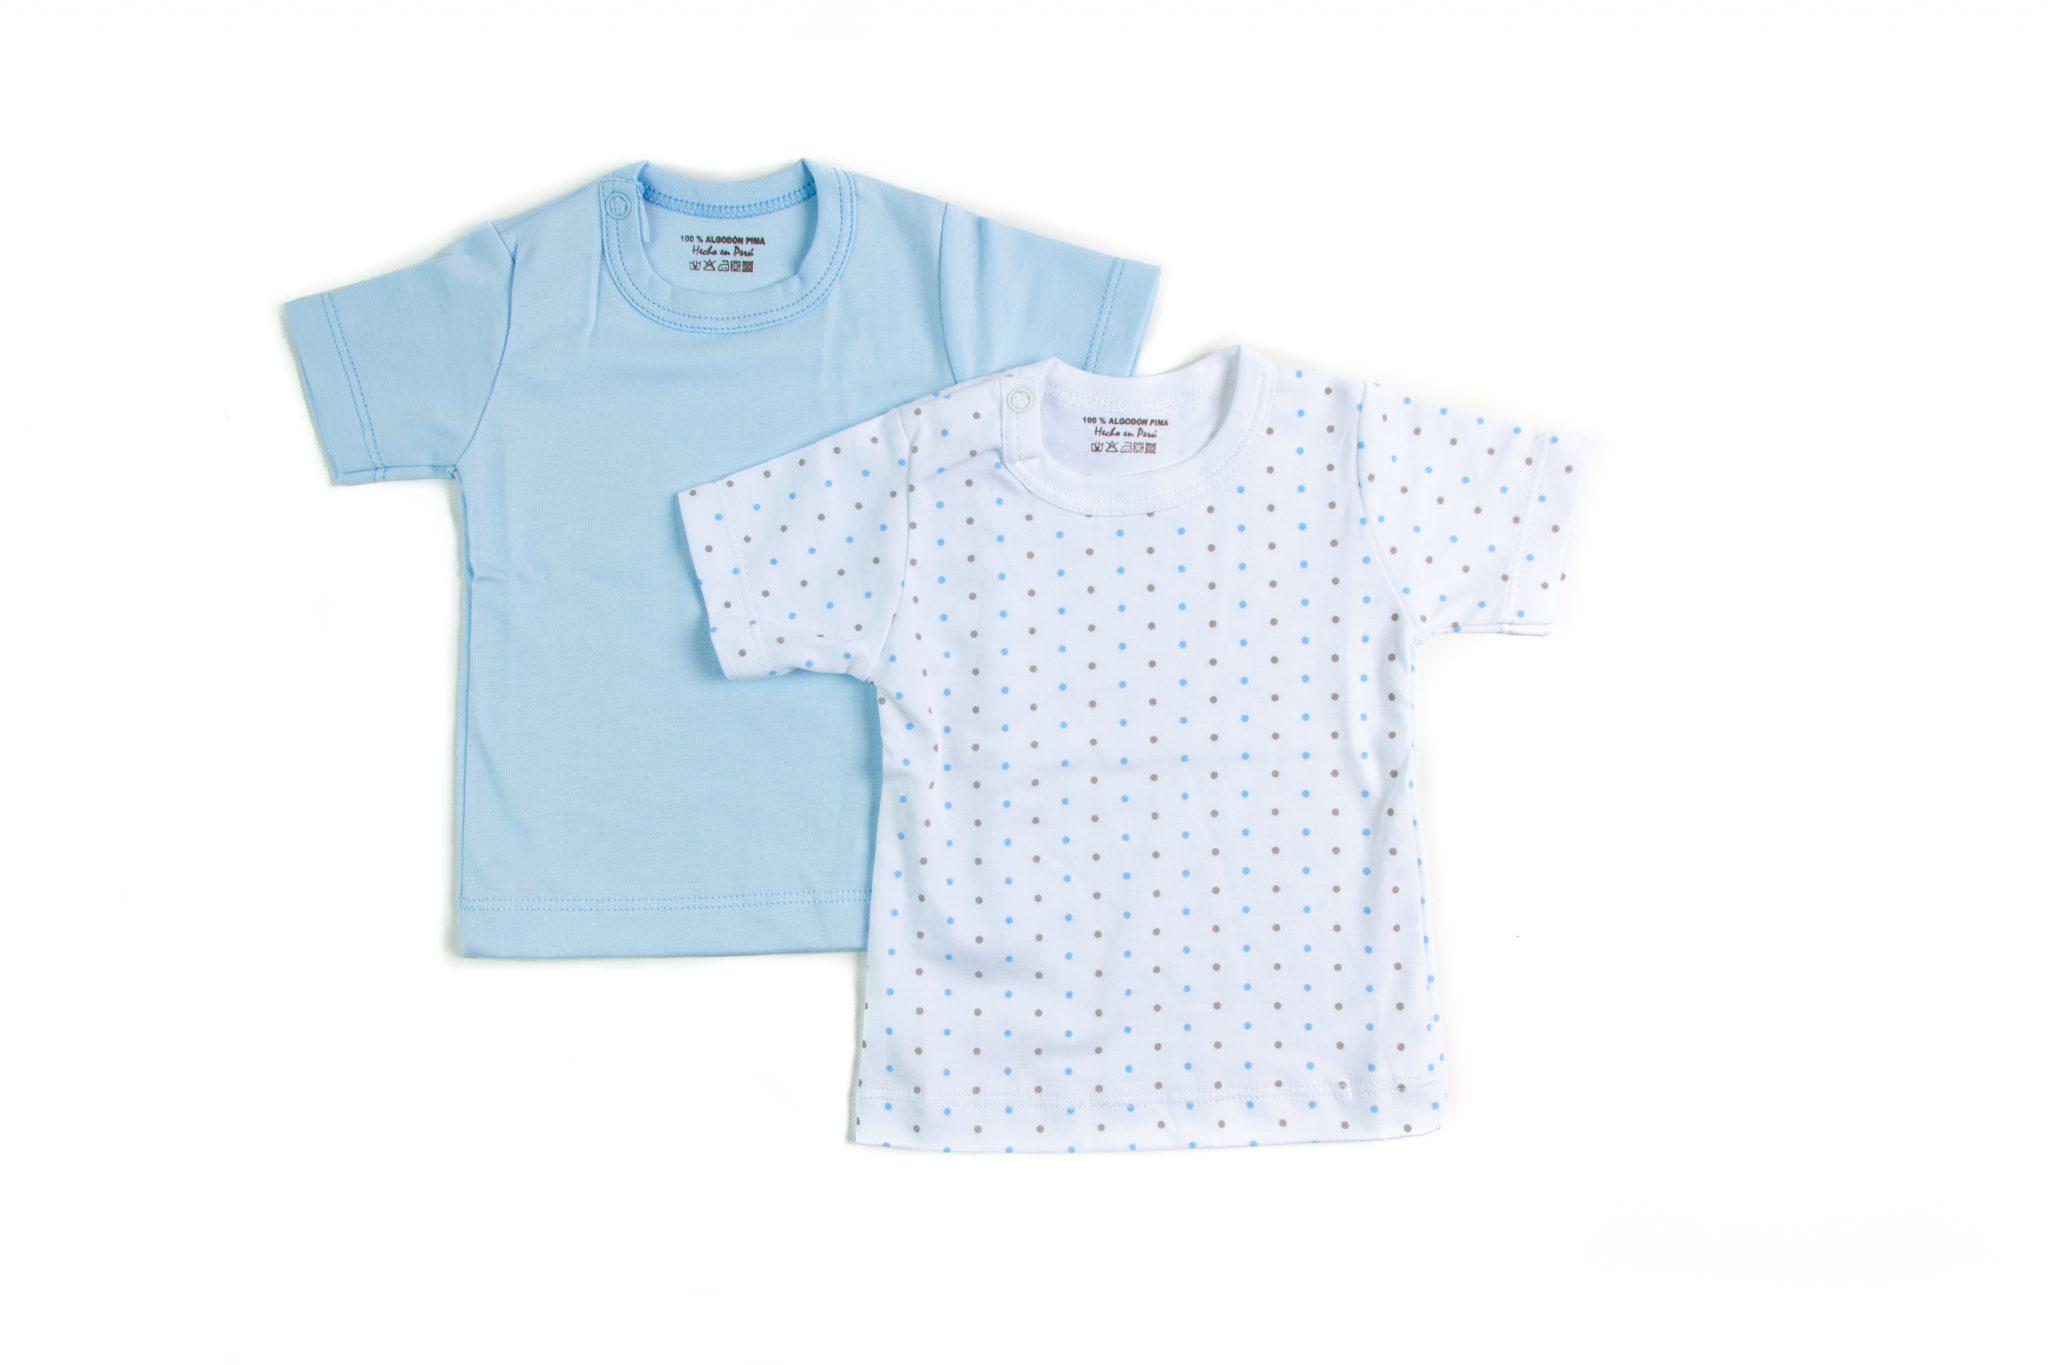 Pack 2 Camisetas Lunares Celeste Manga Corta Algodón Pima